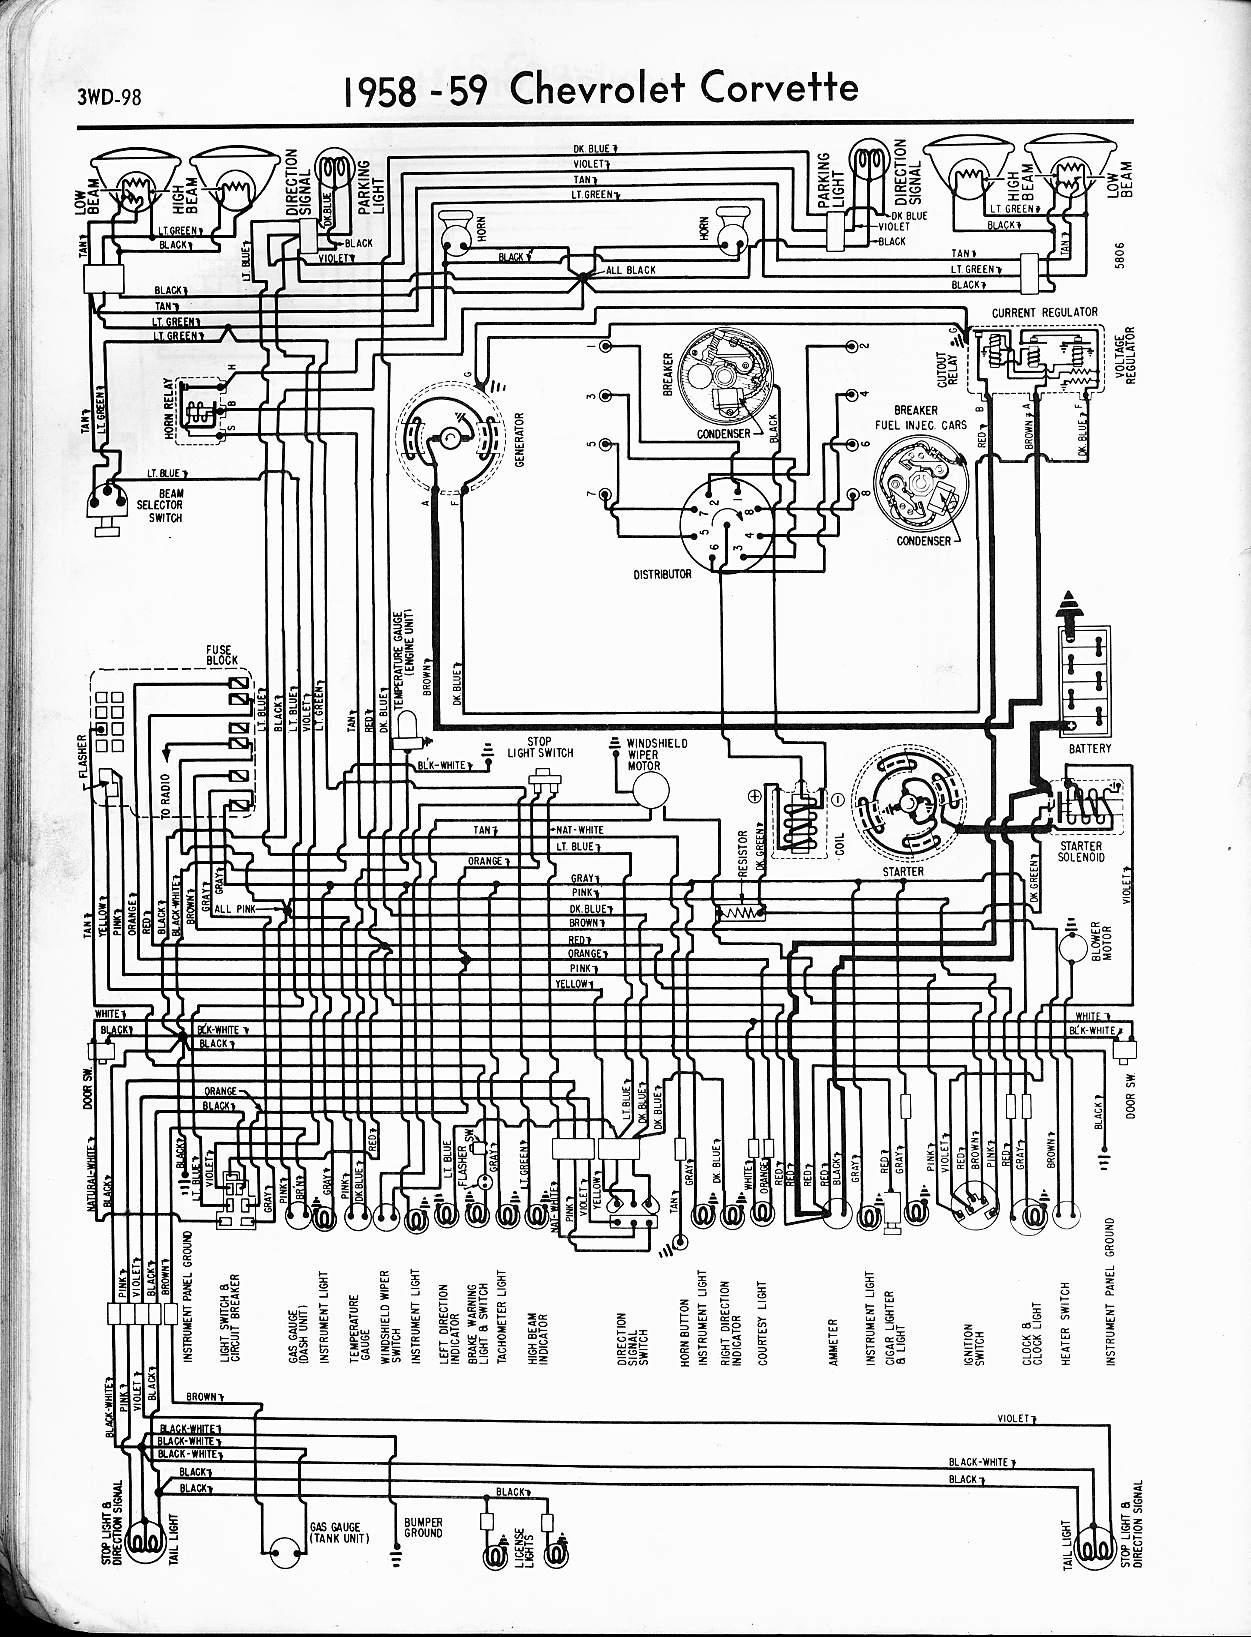 2005 Chevy Impala Wiring Diagram | Free Wiring Diagram